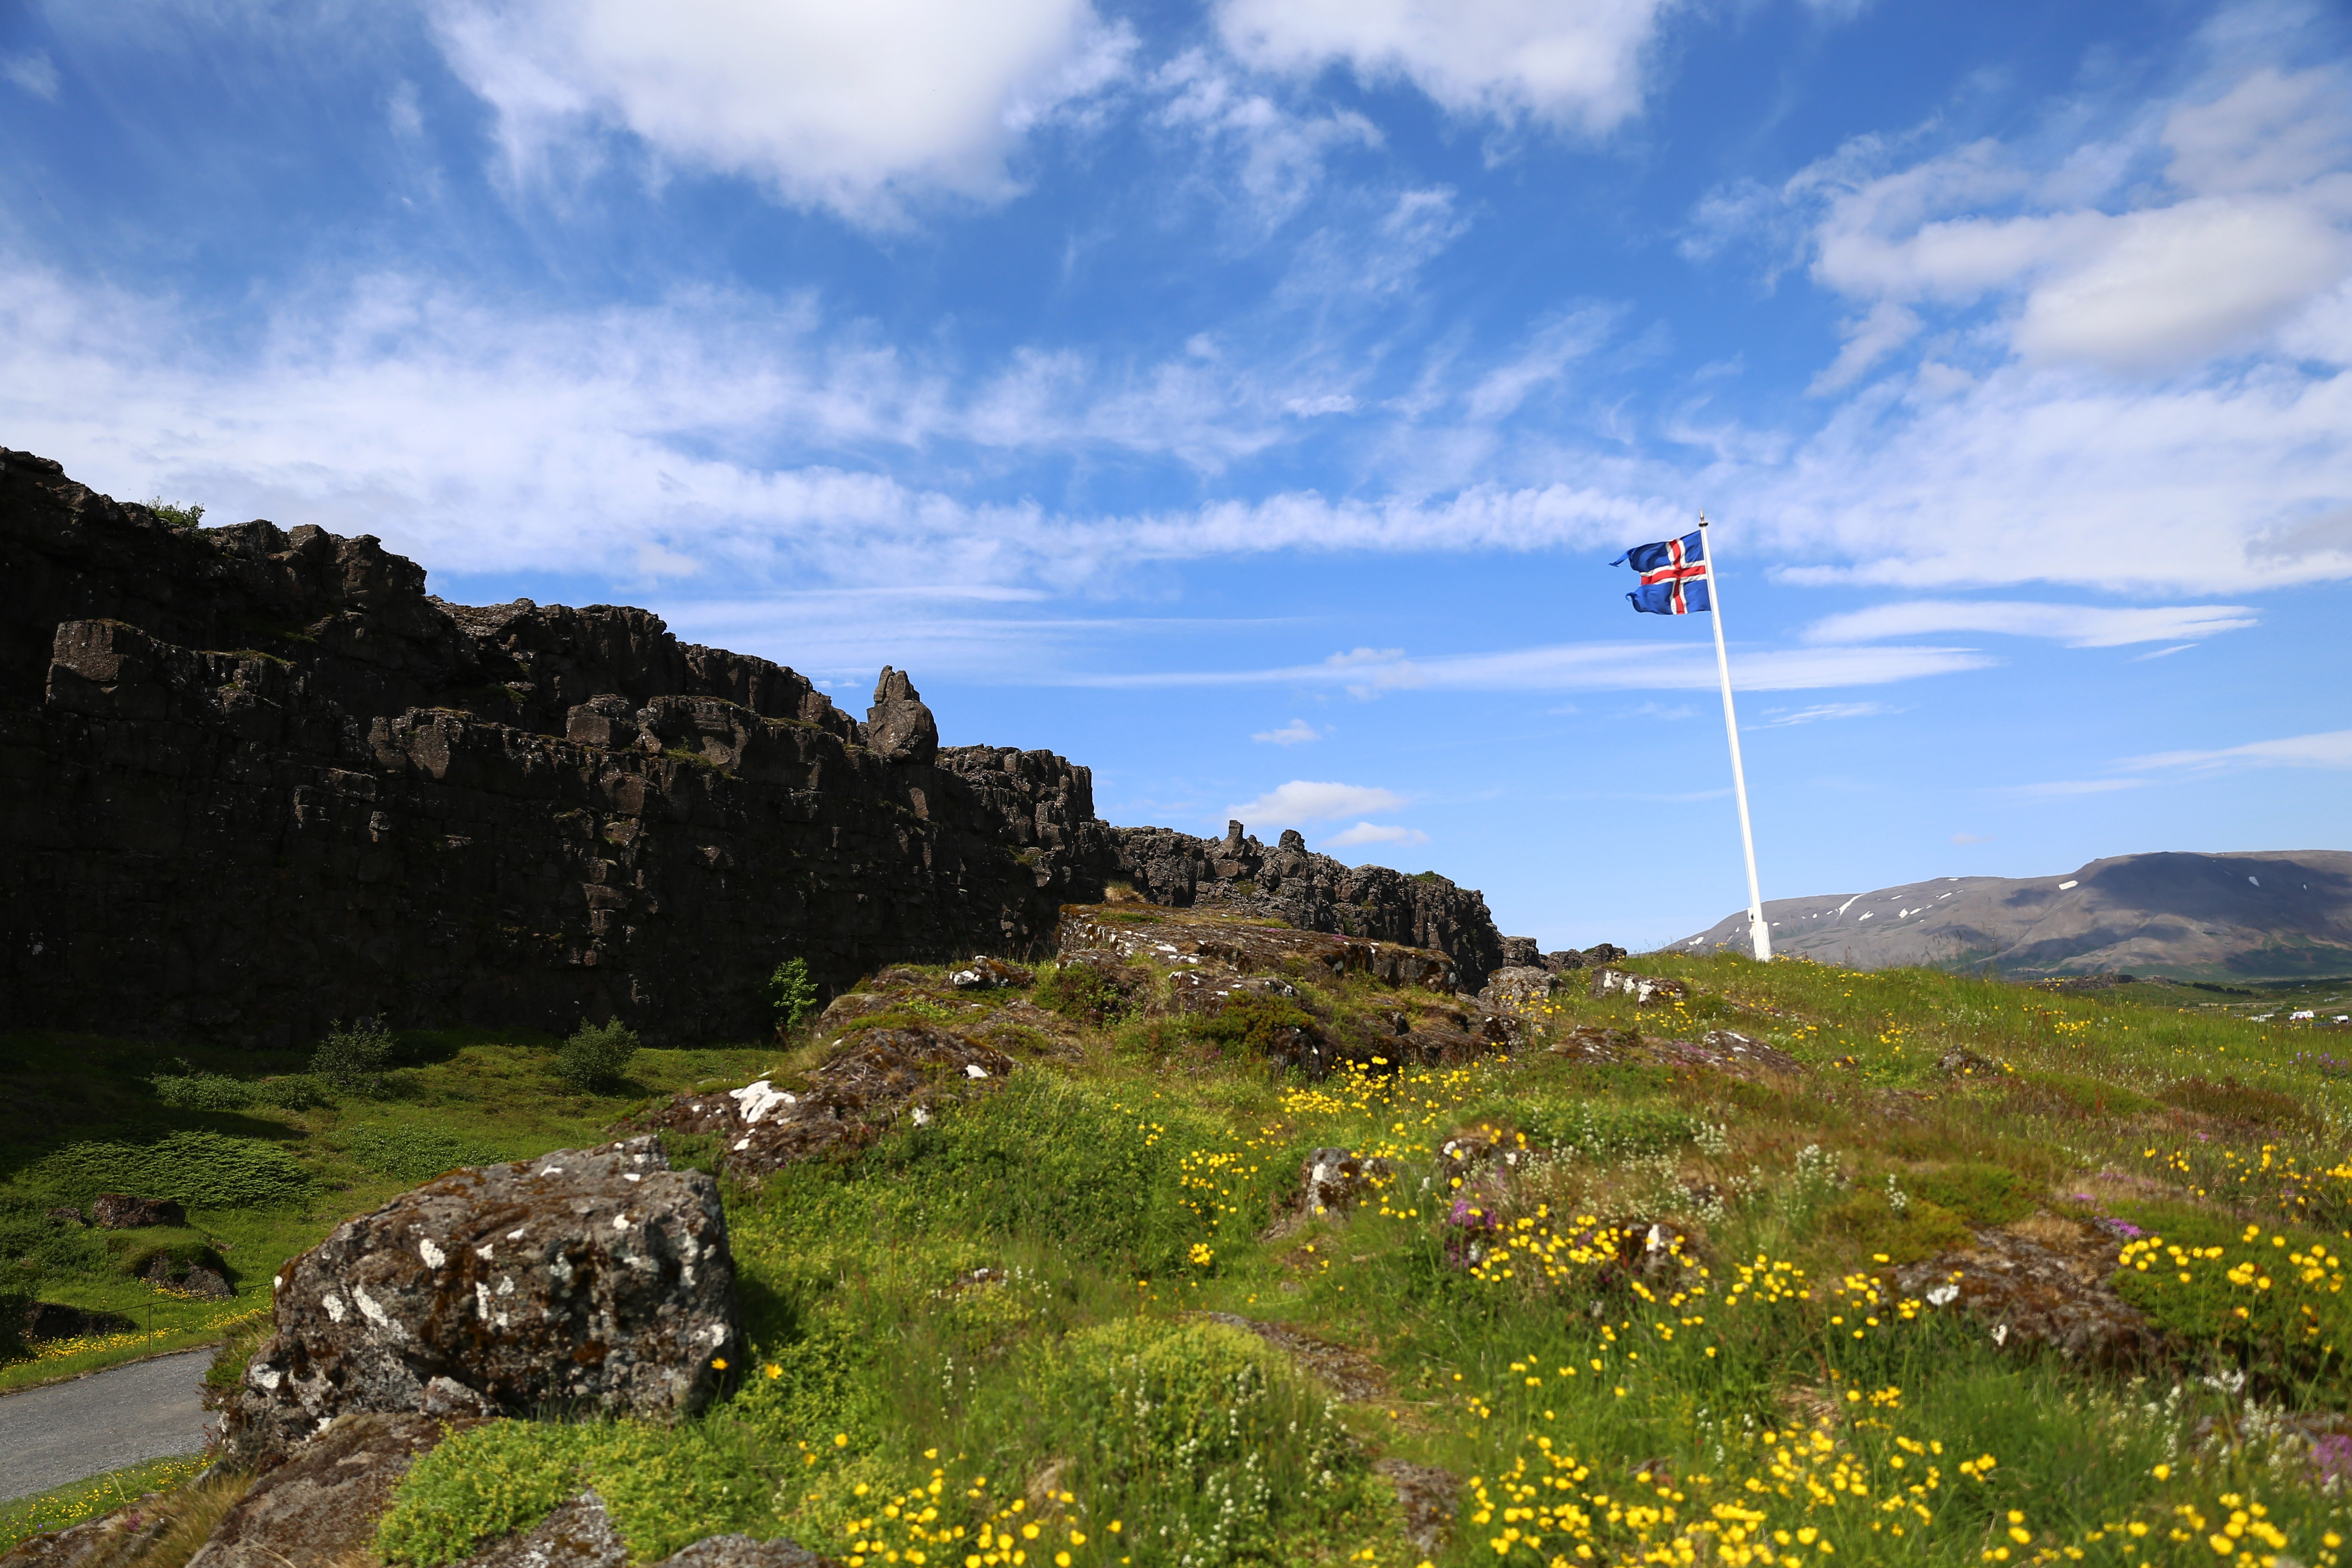 Reisefoto Island: Flagge im Þingvellir Nationalpark ©Imke Haverbusch